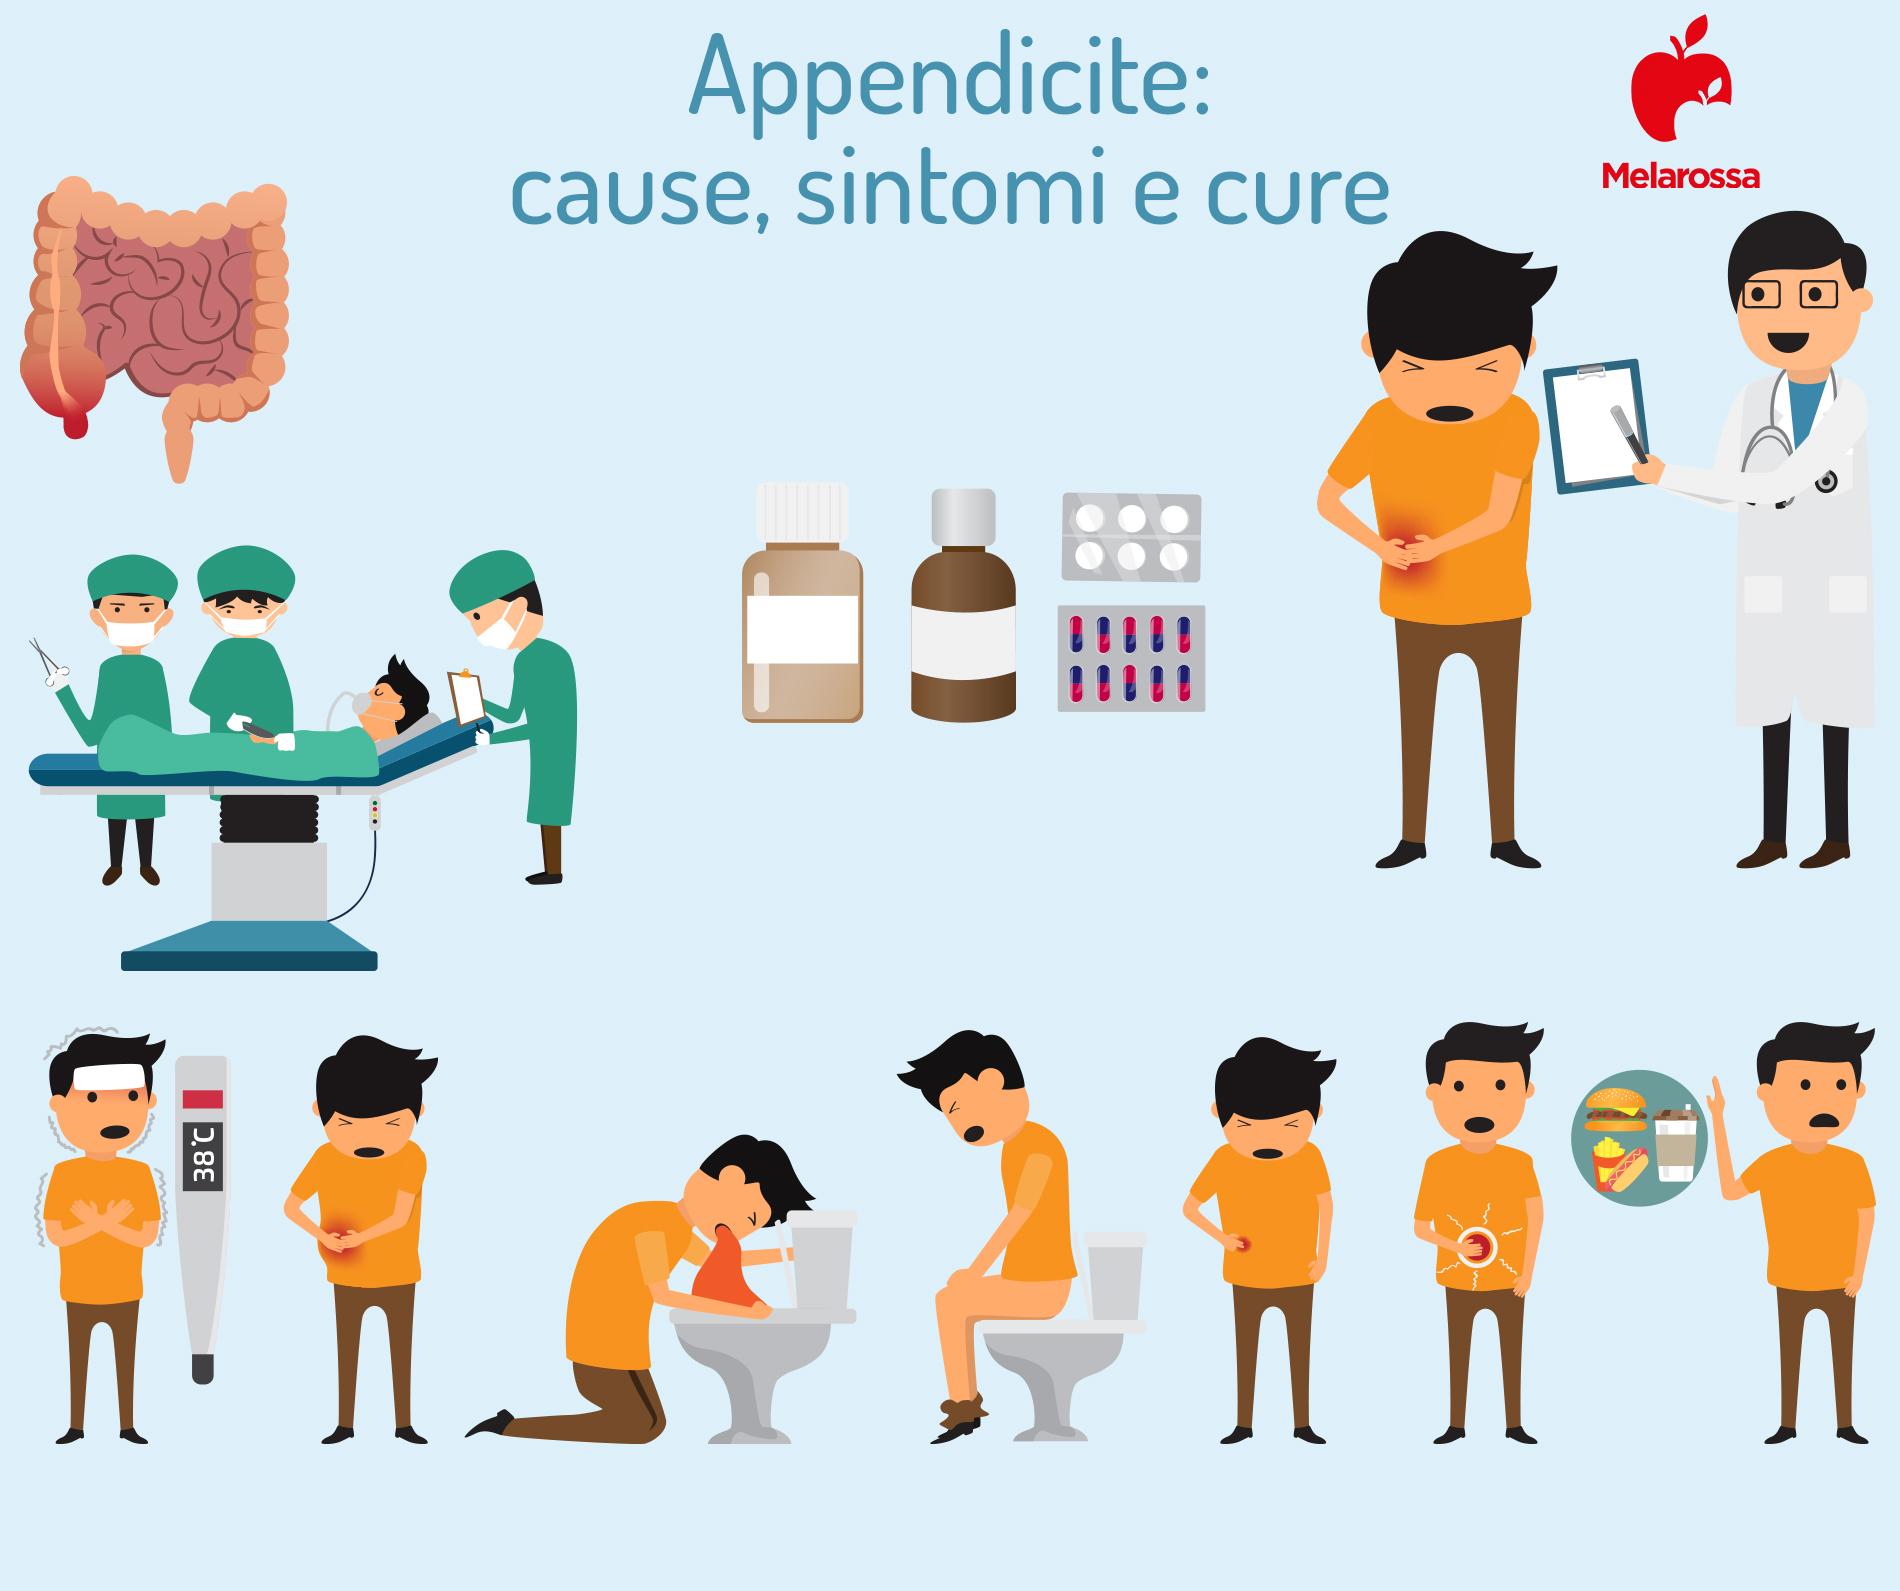 appendicite: cos'è, cause e sintomi